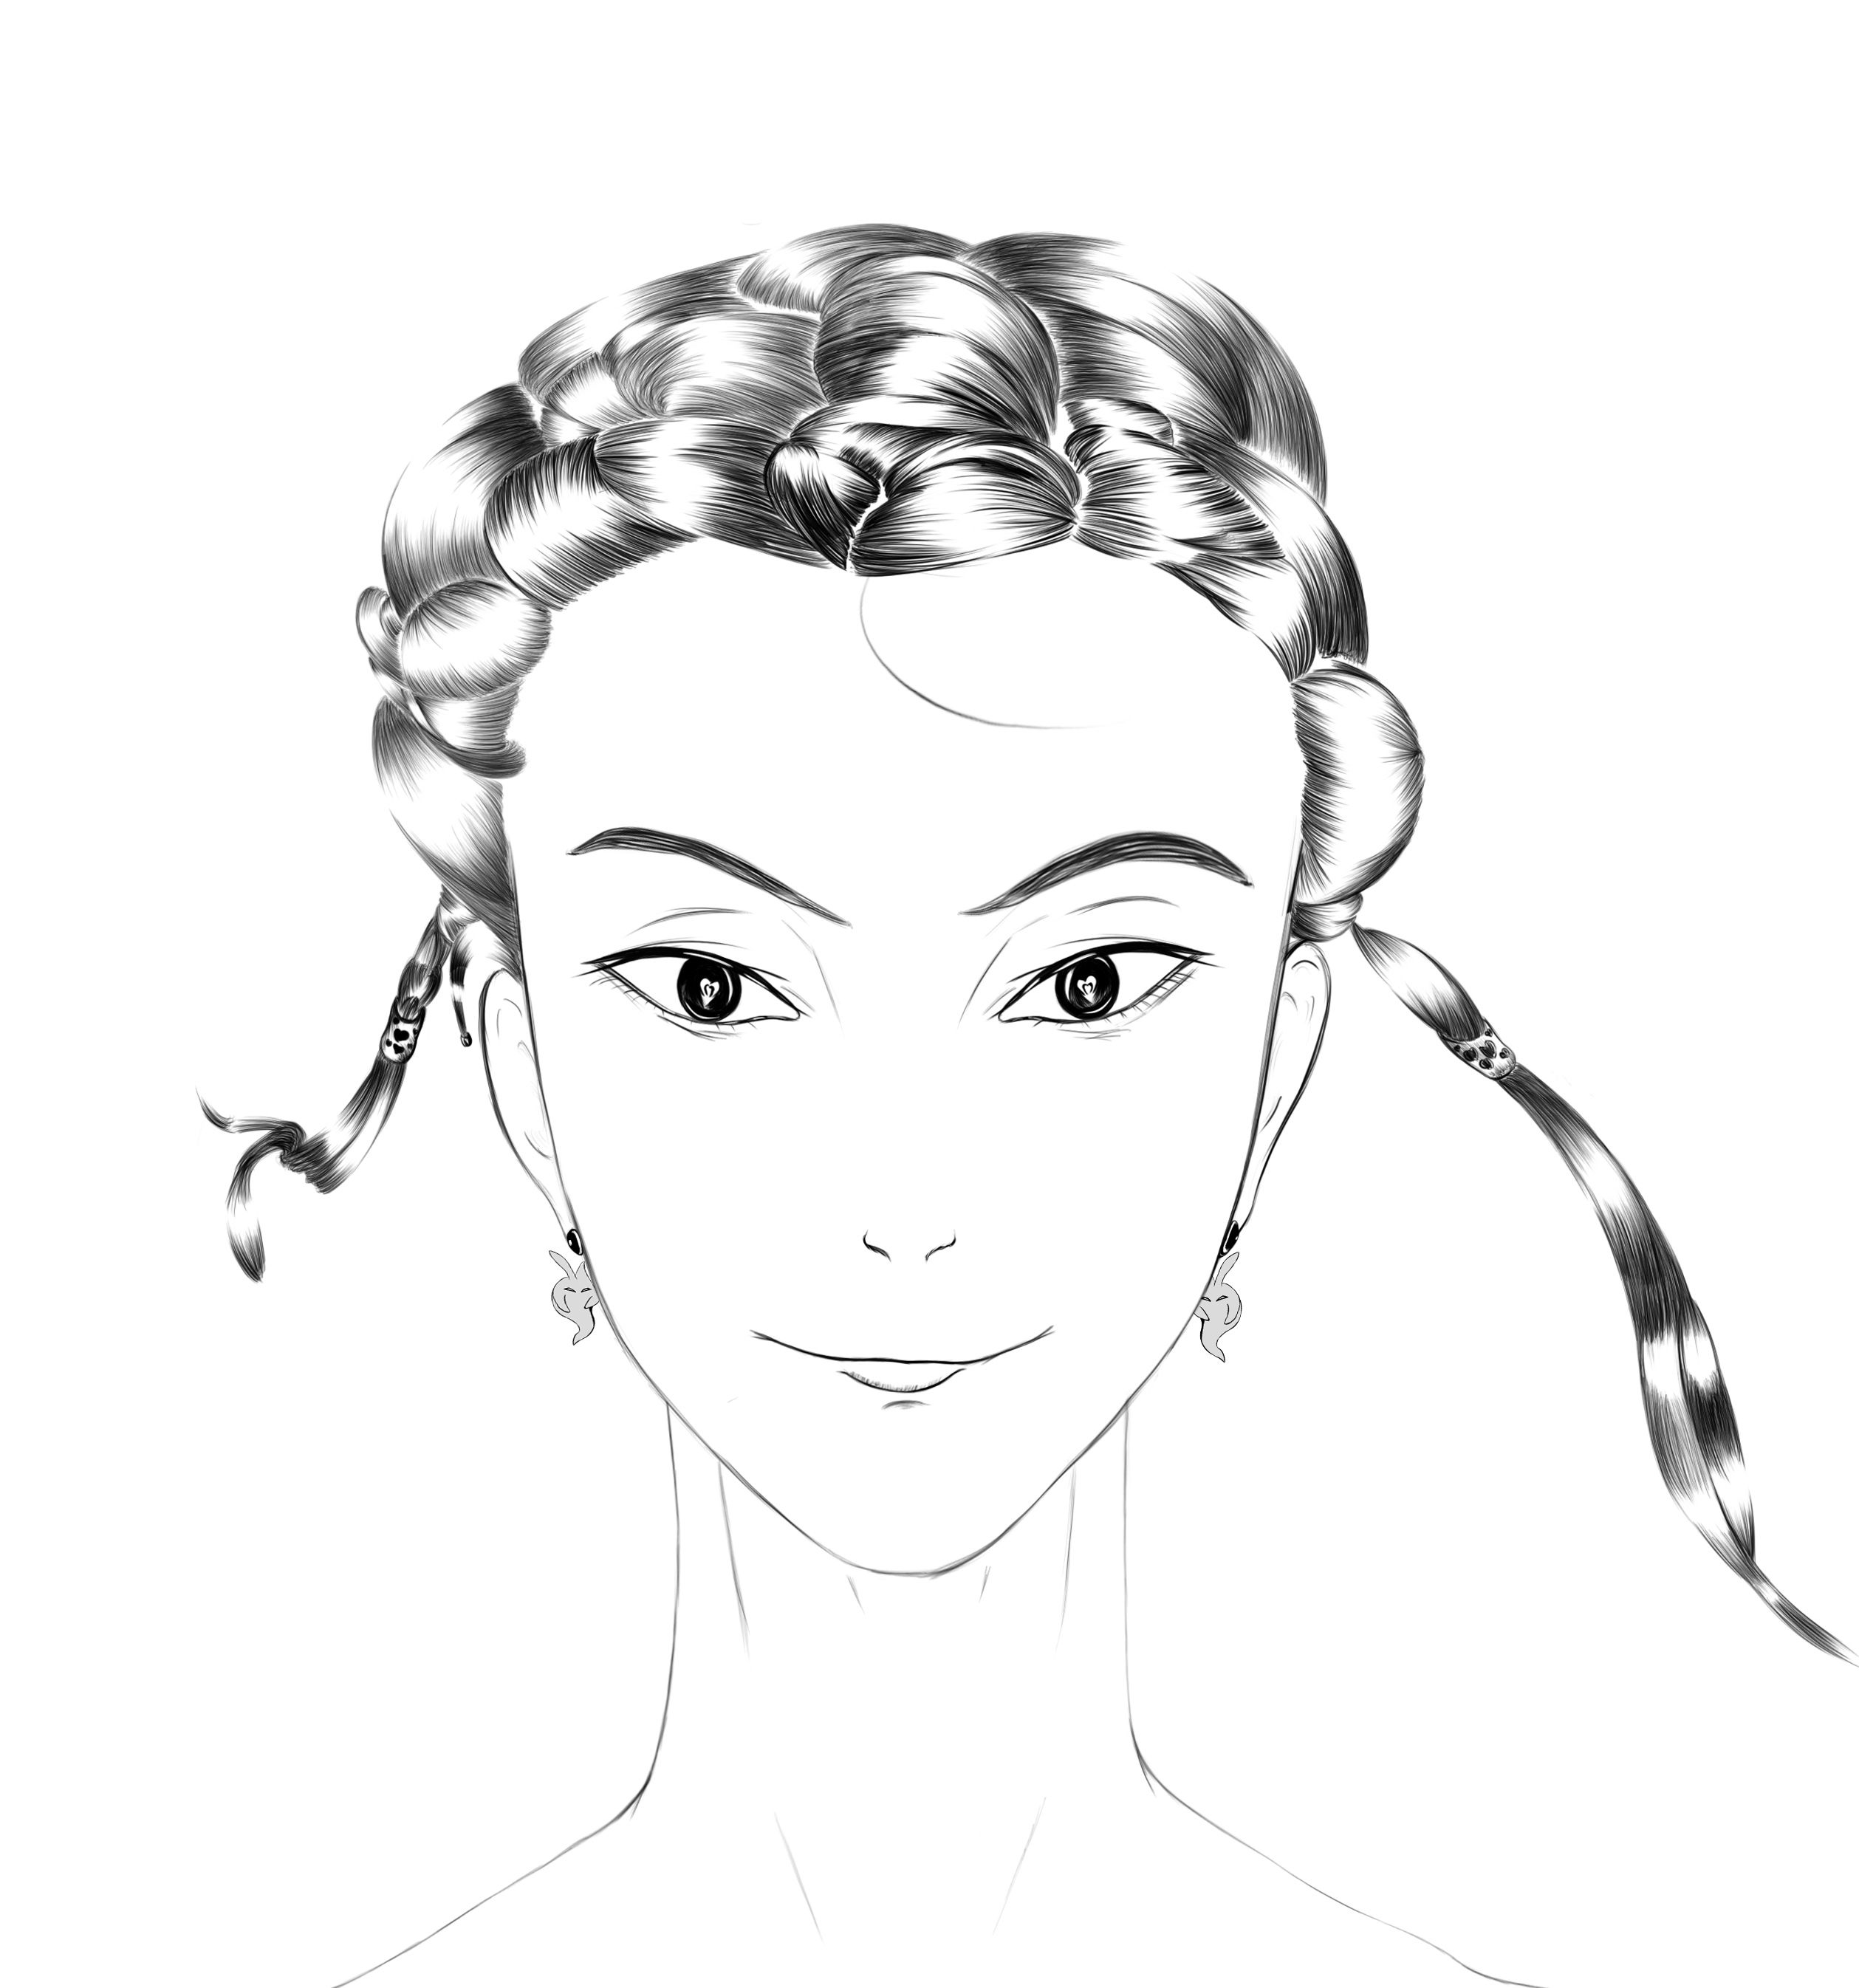 The Hairstylish-digital sketches Showflipper